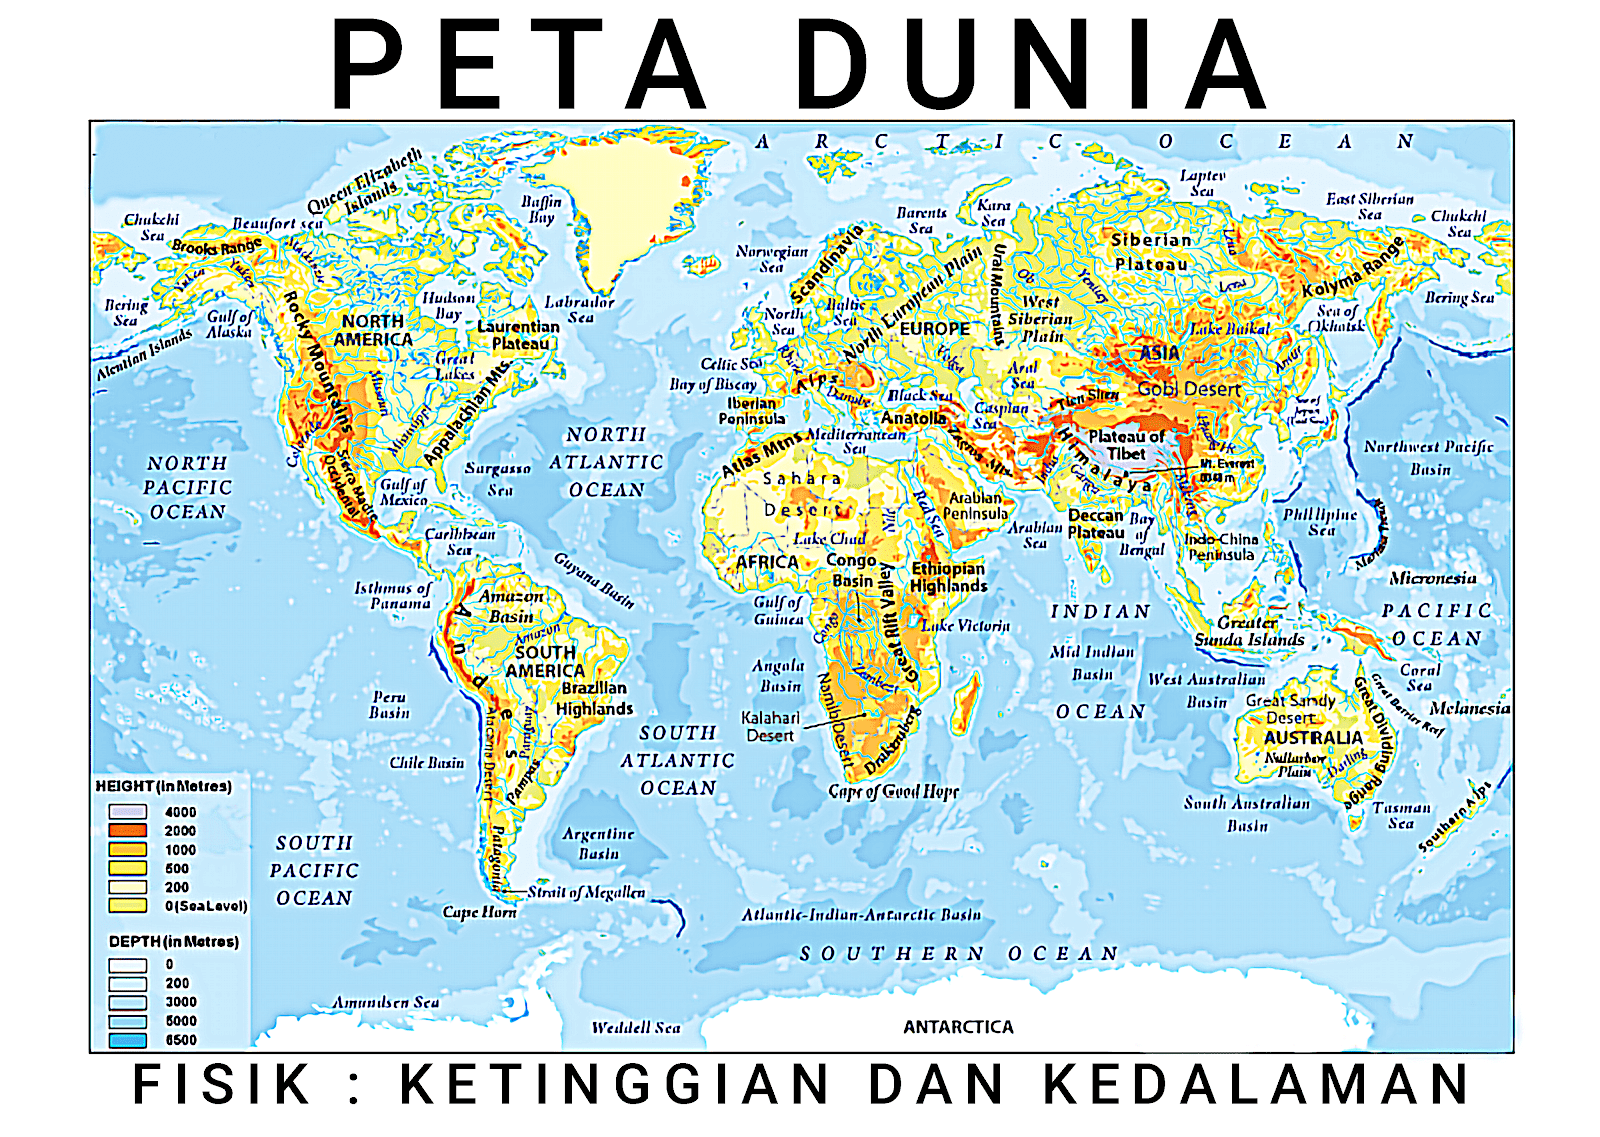 gambar peta dunia ukuran besar berdasarkan ketinggian